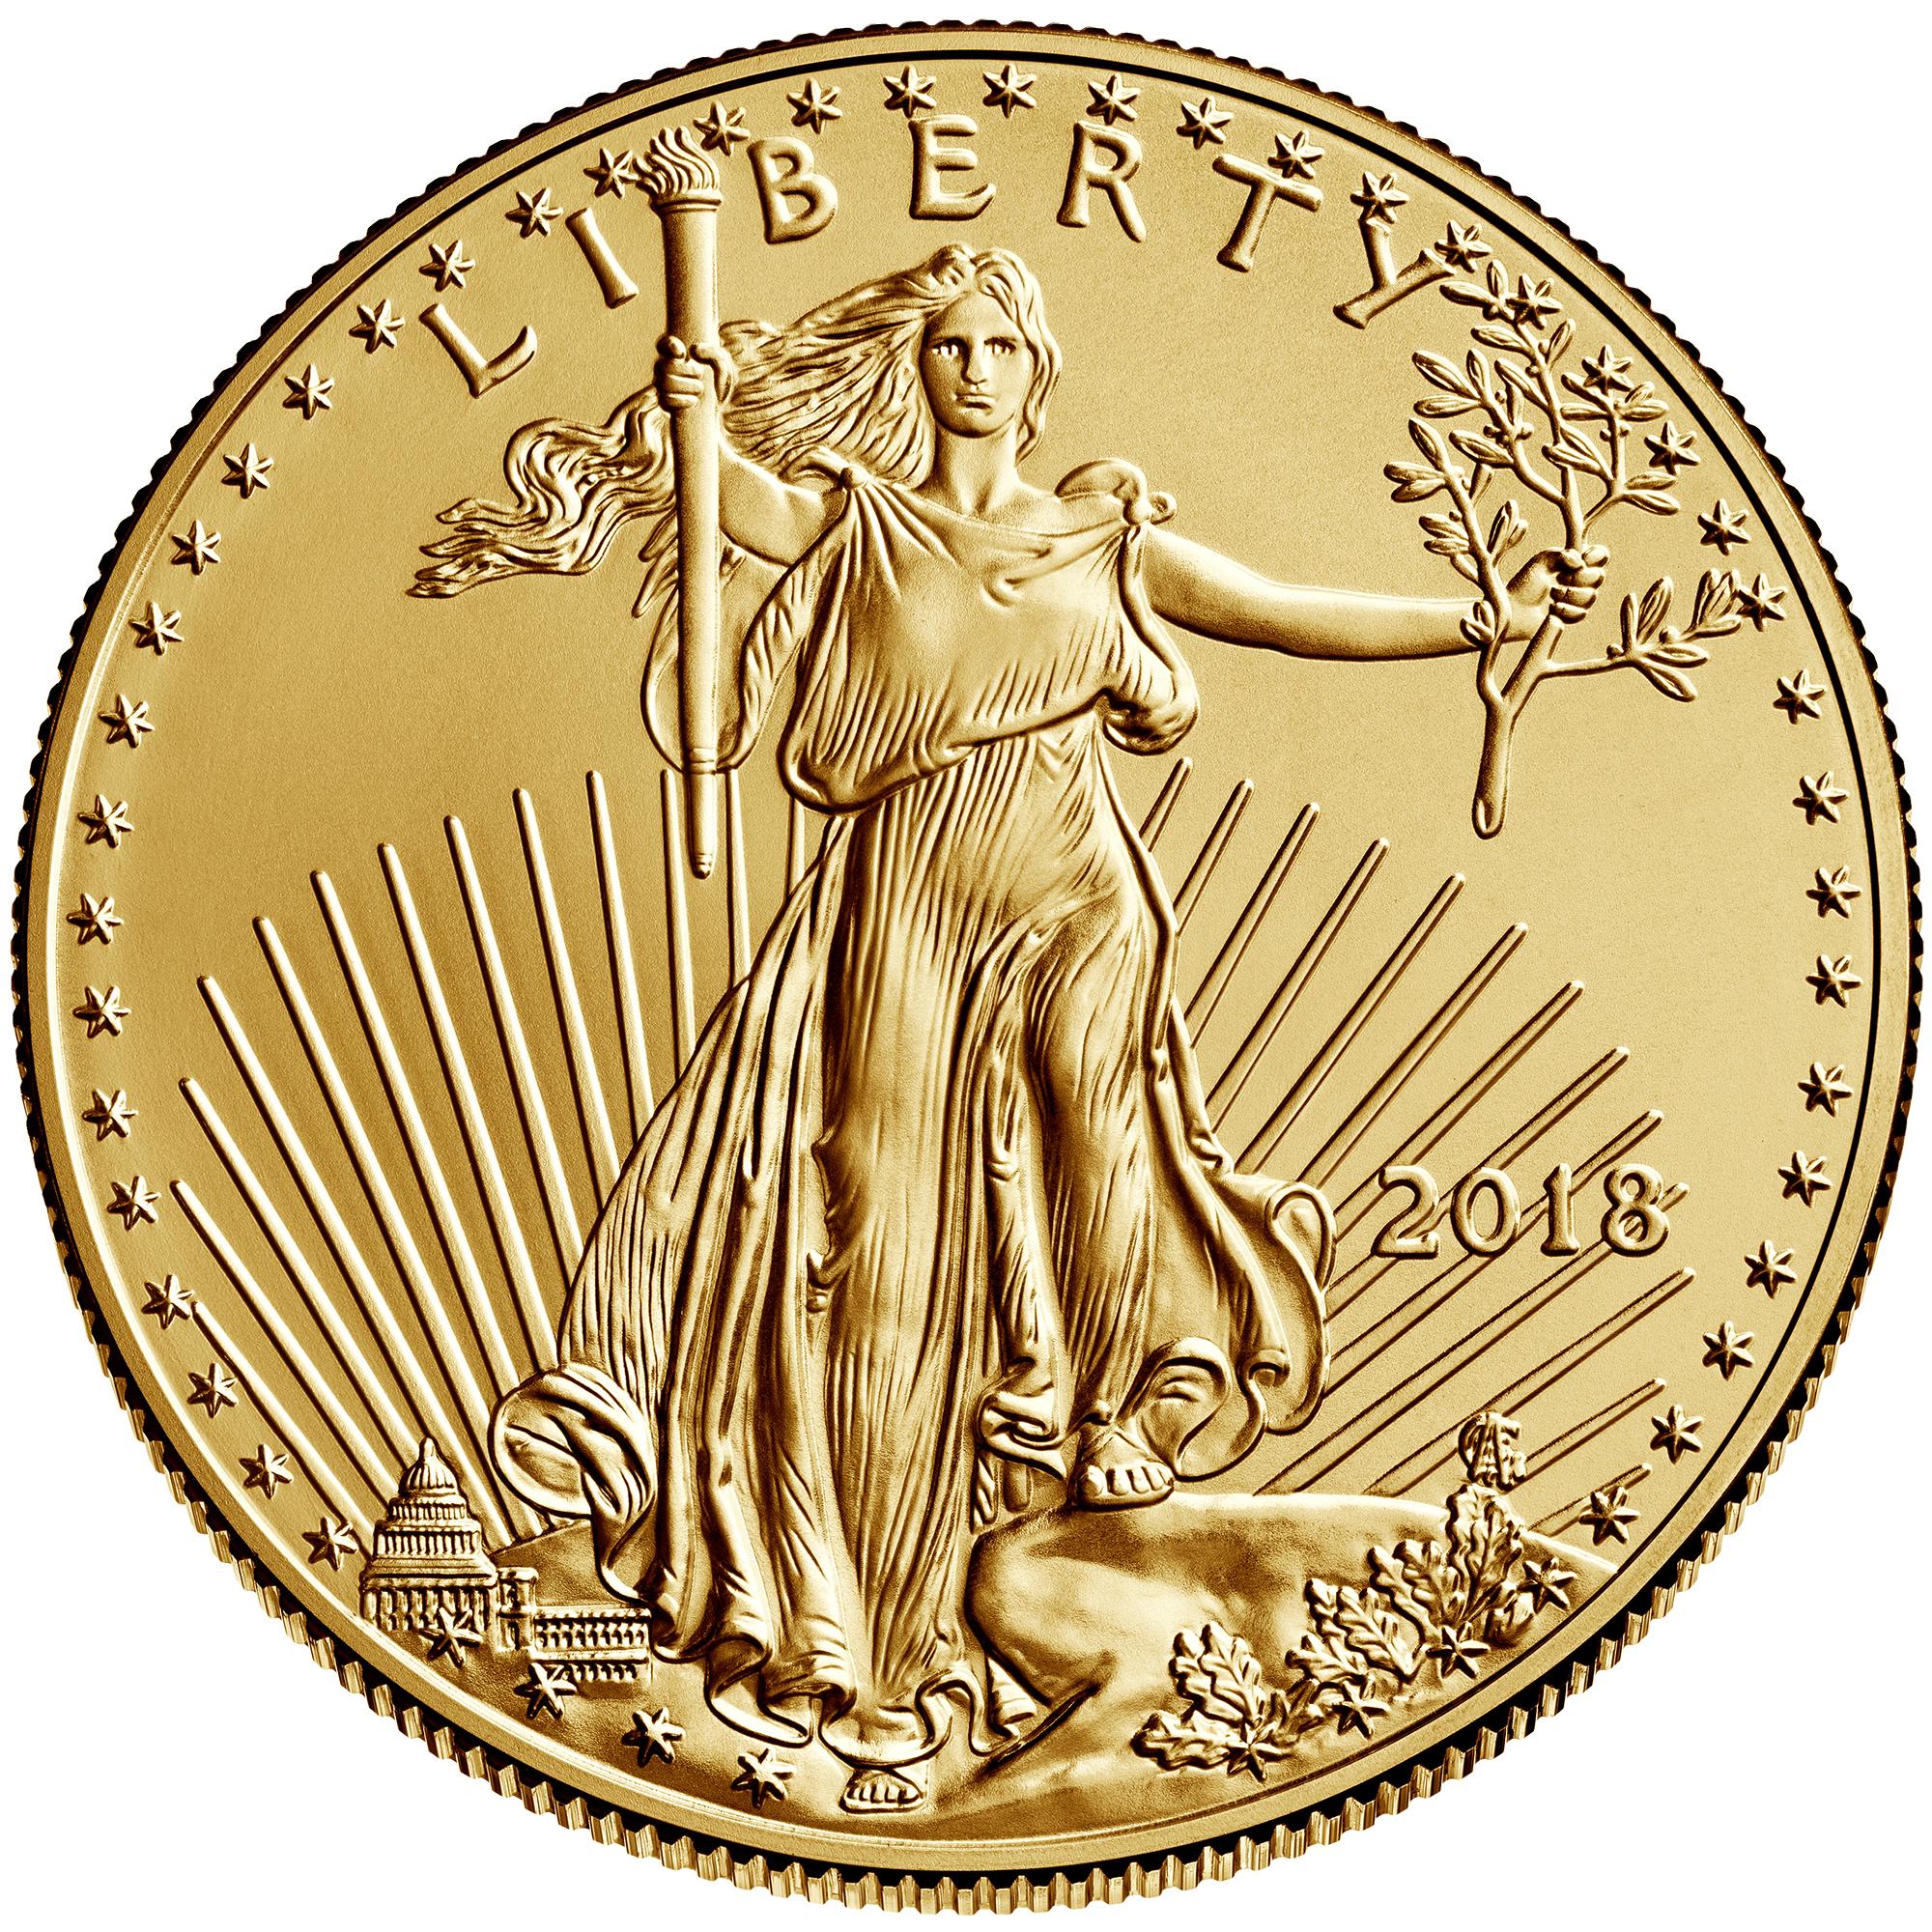 main image for Jeff Garrett sees golden opportunity in rising gold prices